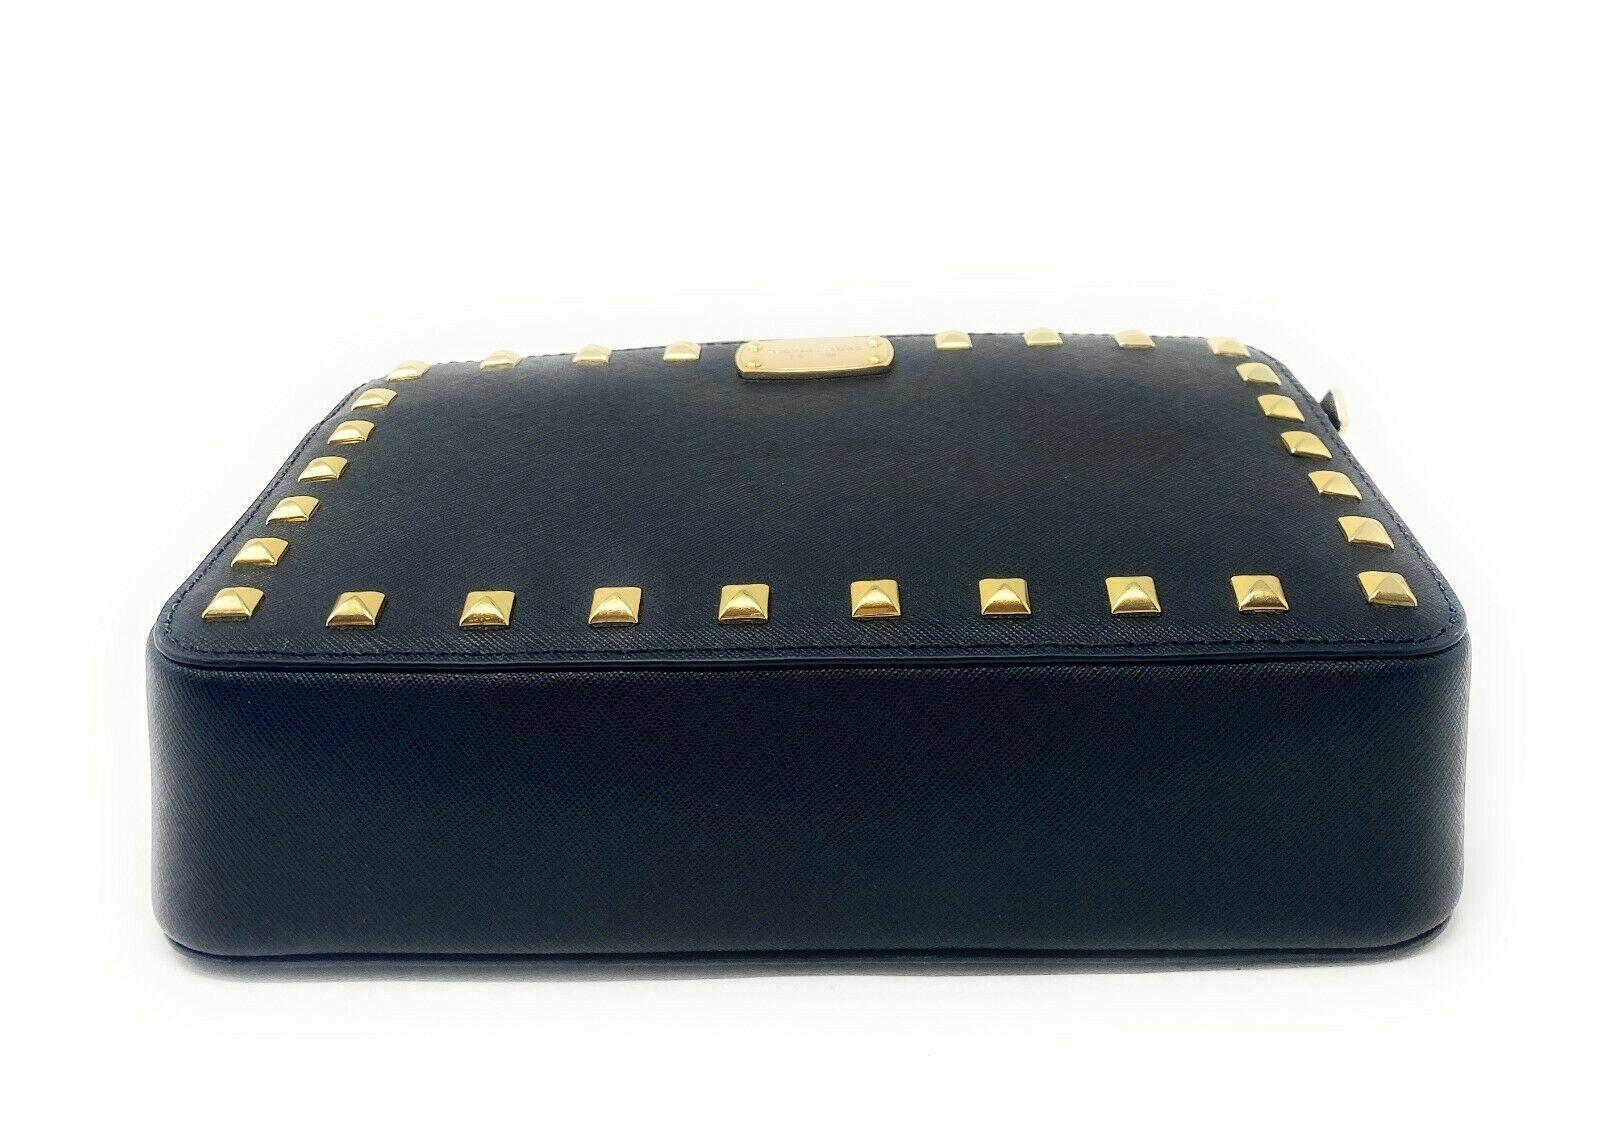 thumbnail 54 - Michael Kors Jet Set Item Large East West Crossbody Chain Handbag Clutch $298